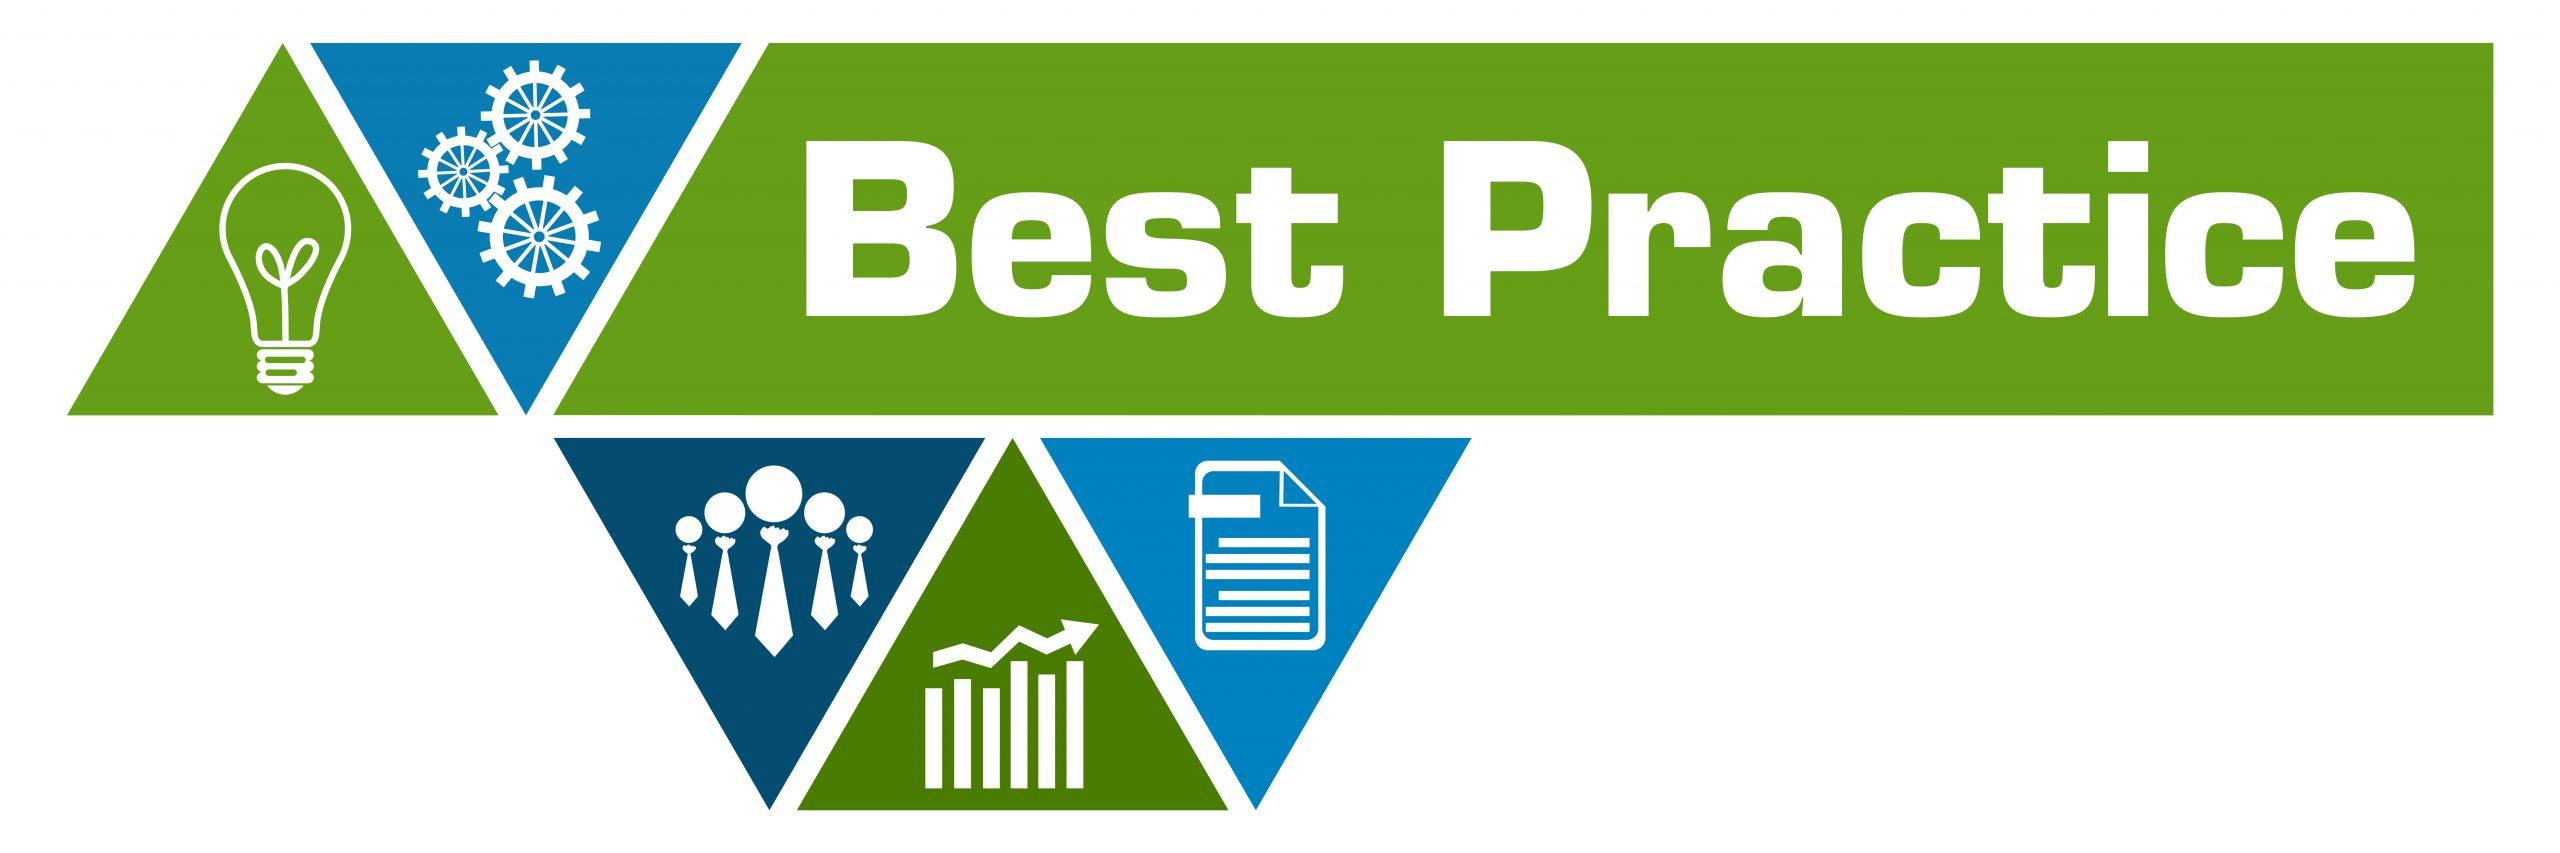 List of best practices to stop wasteful spending